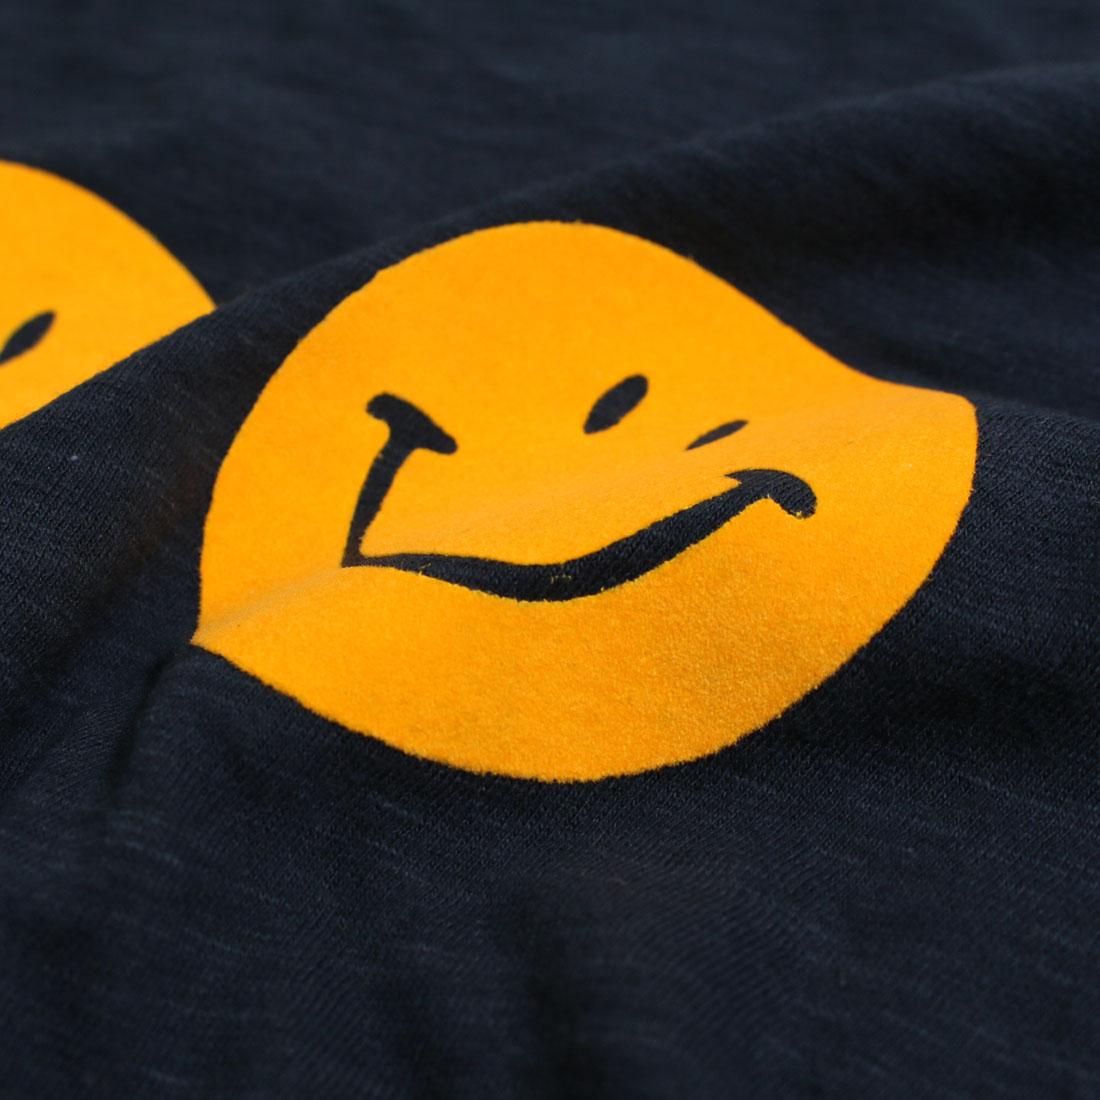 rough&swell ラフ&スウェル 【送料無料】 3 SMILES TEE(M L)半袖Tシャツ メール便不可